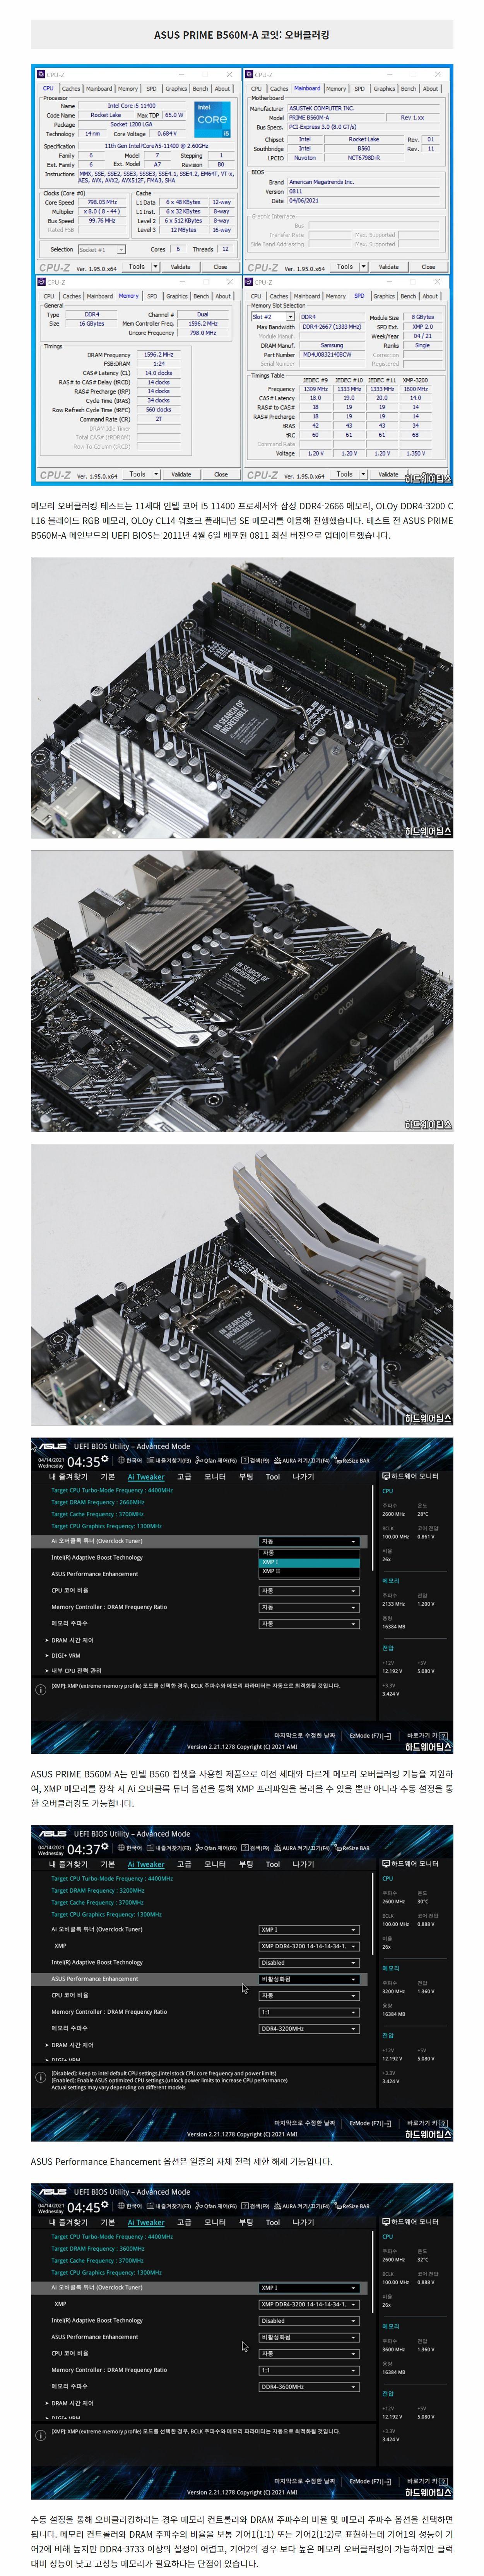 ASUS_PRIME_B560M-A_코잇_7.jpg